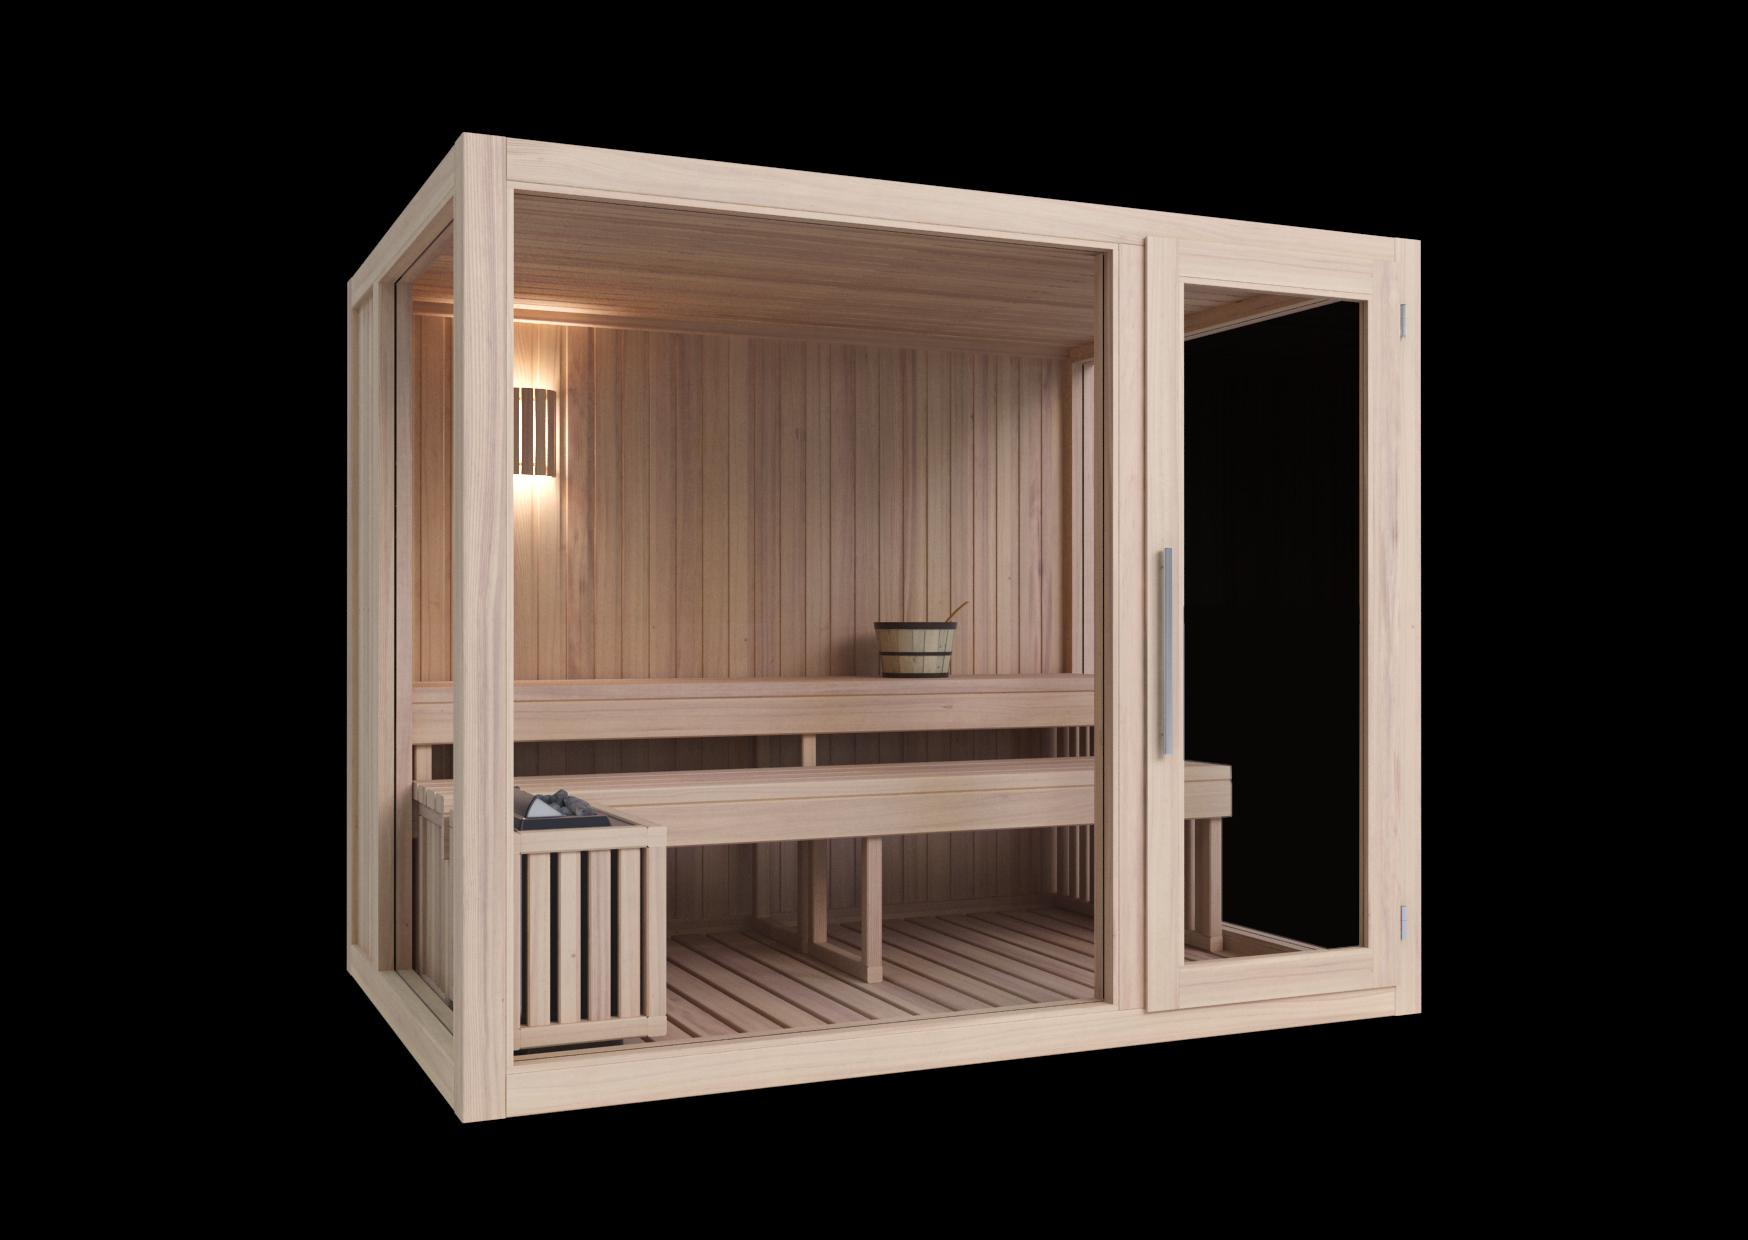 sauna mod rygenera space cod 2030finspry